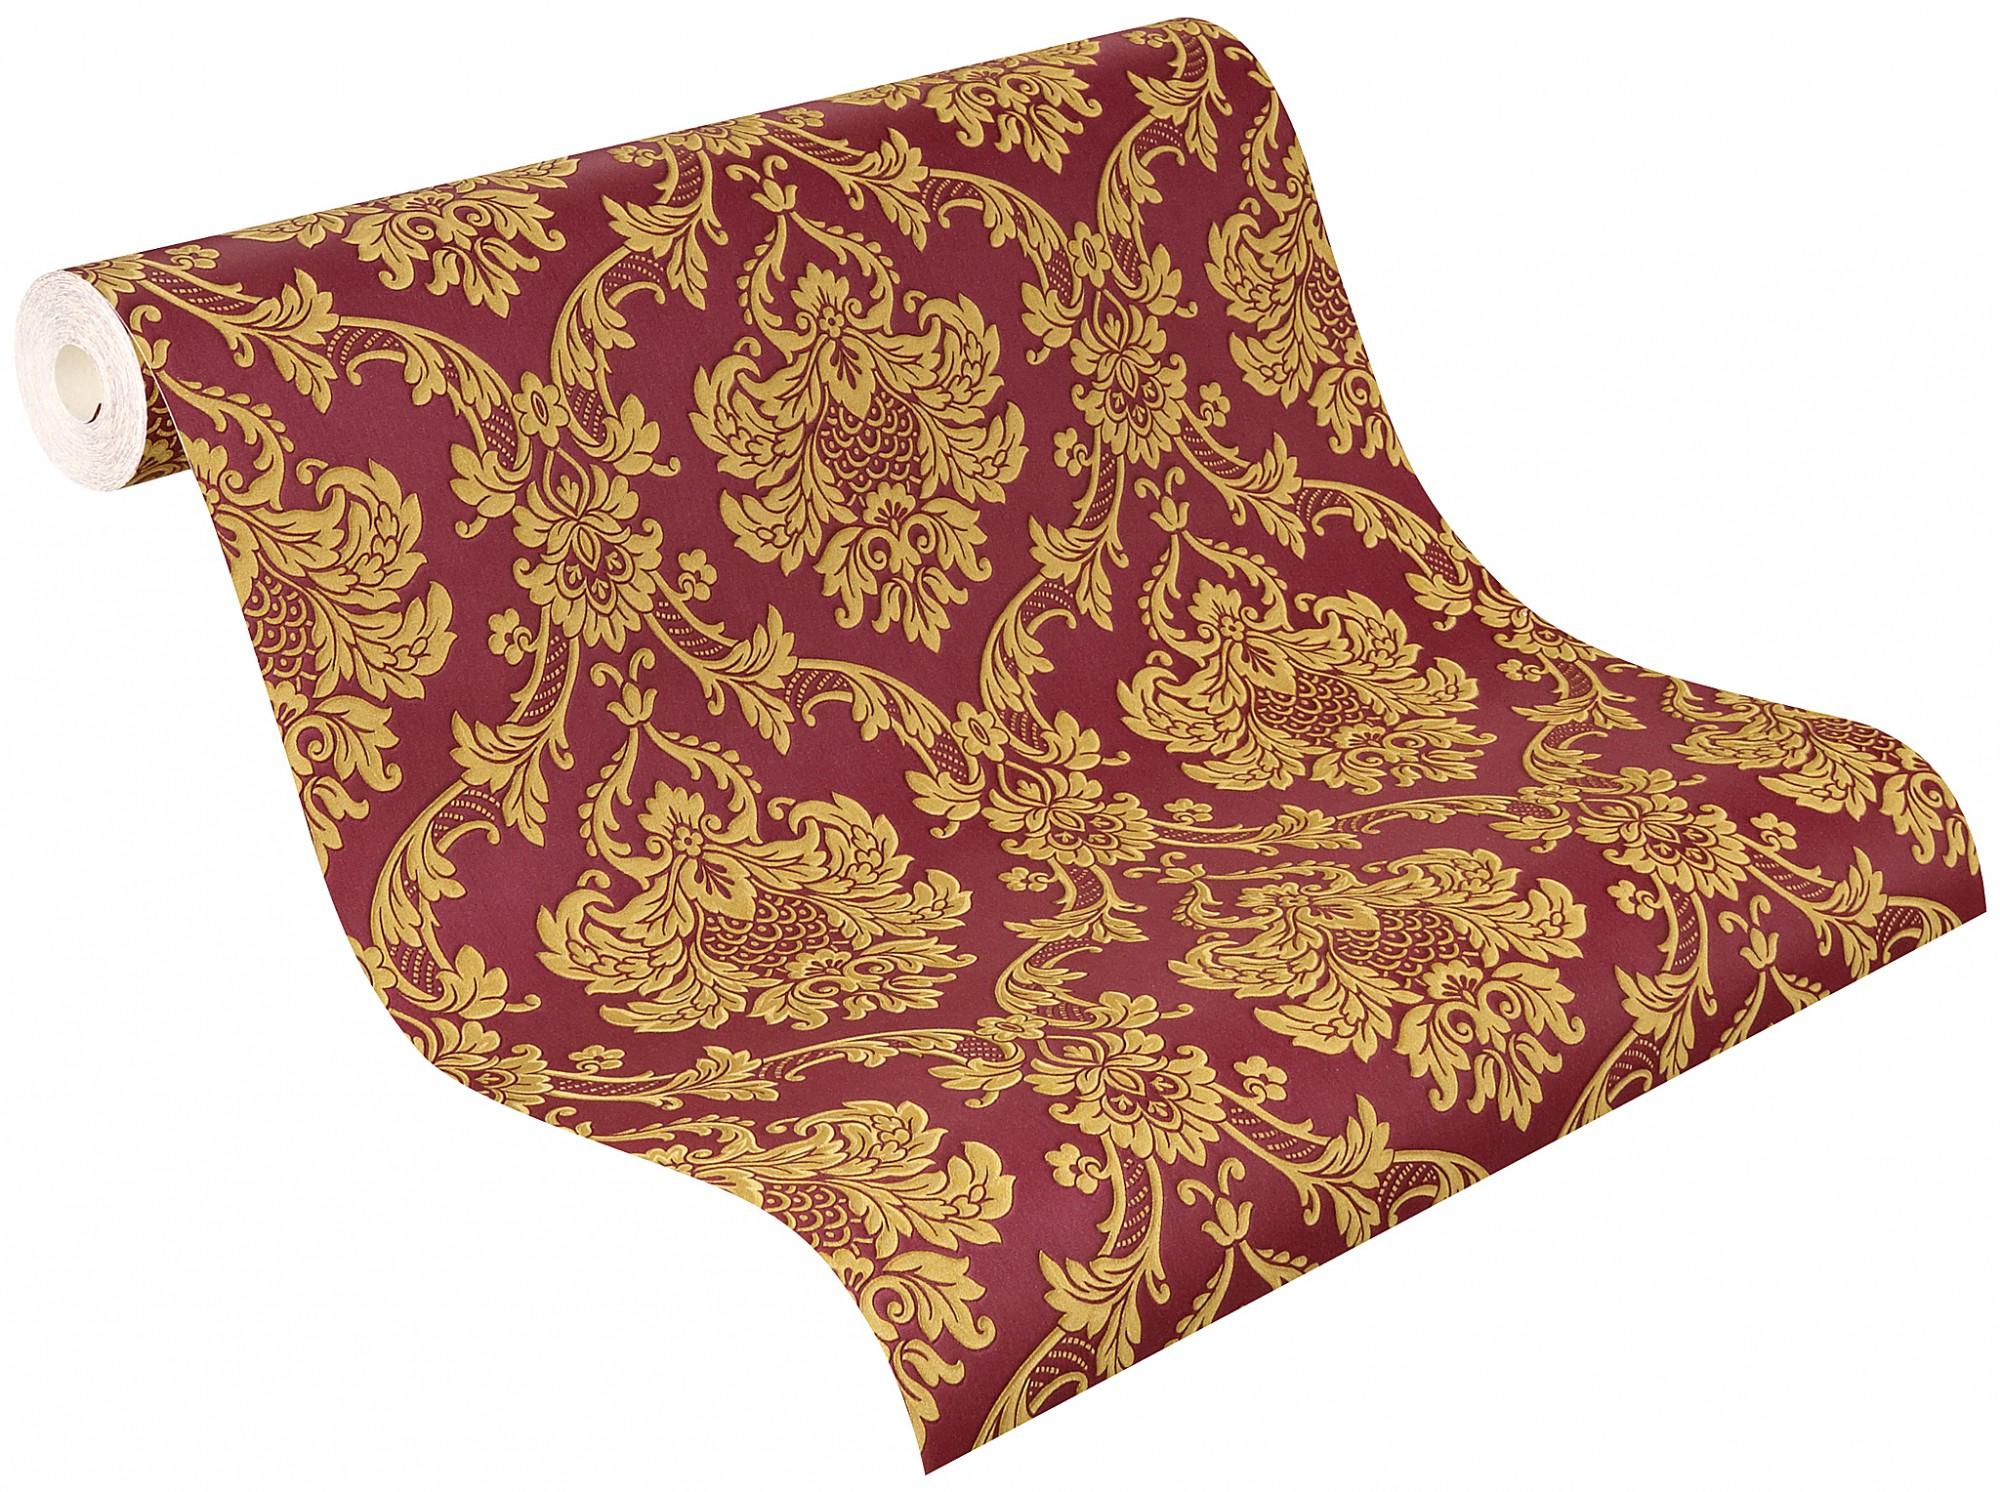 Barock Tapete Auf Leinwand : Tapete Barock Ornamente Rasch Trianon rot gold 505368